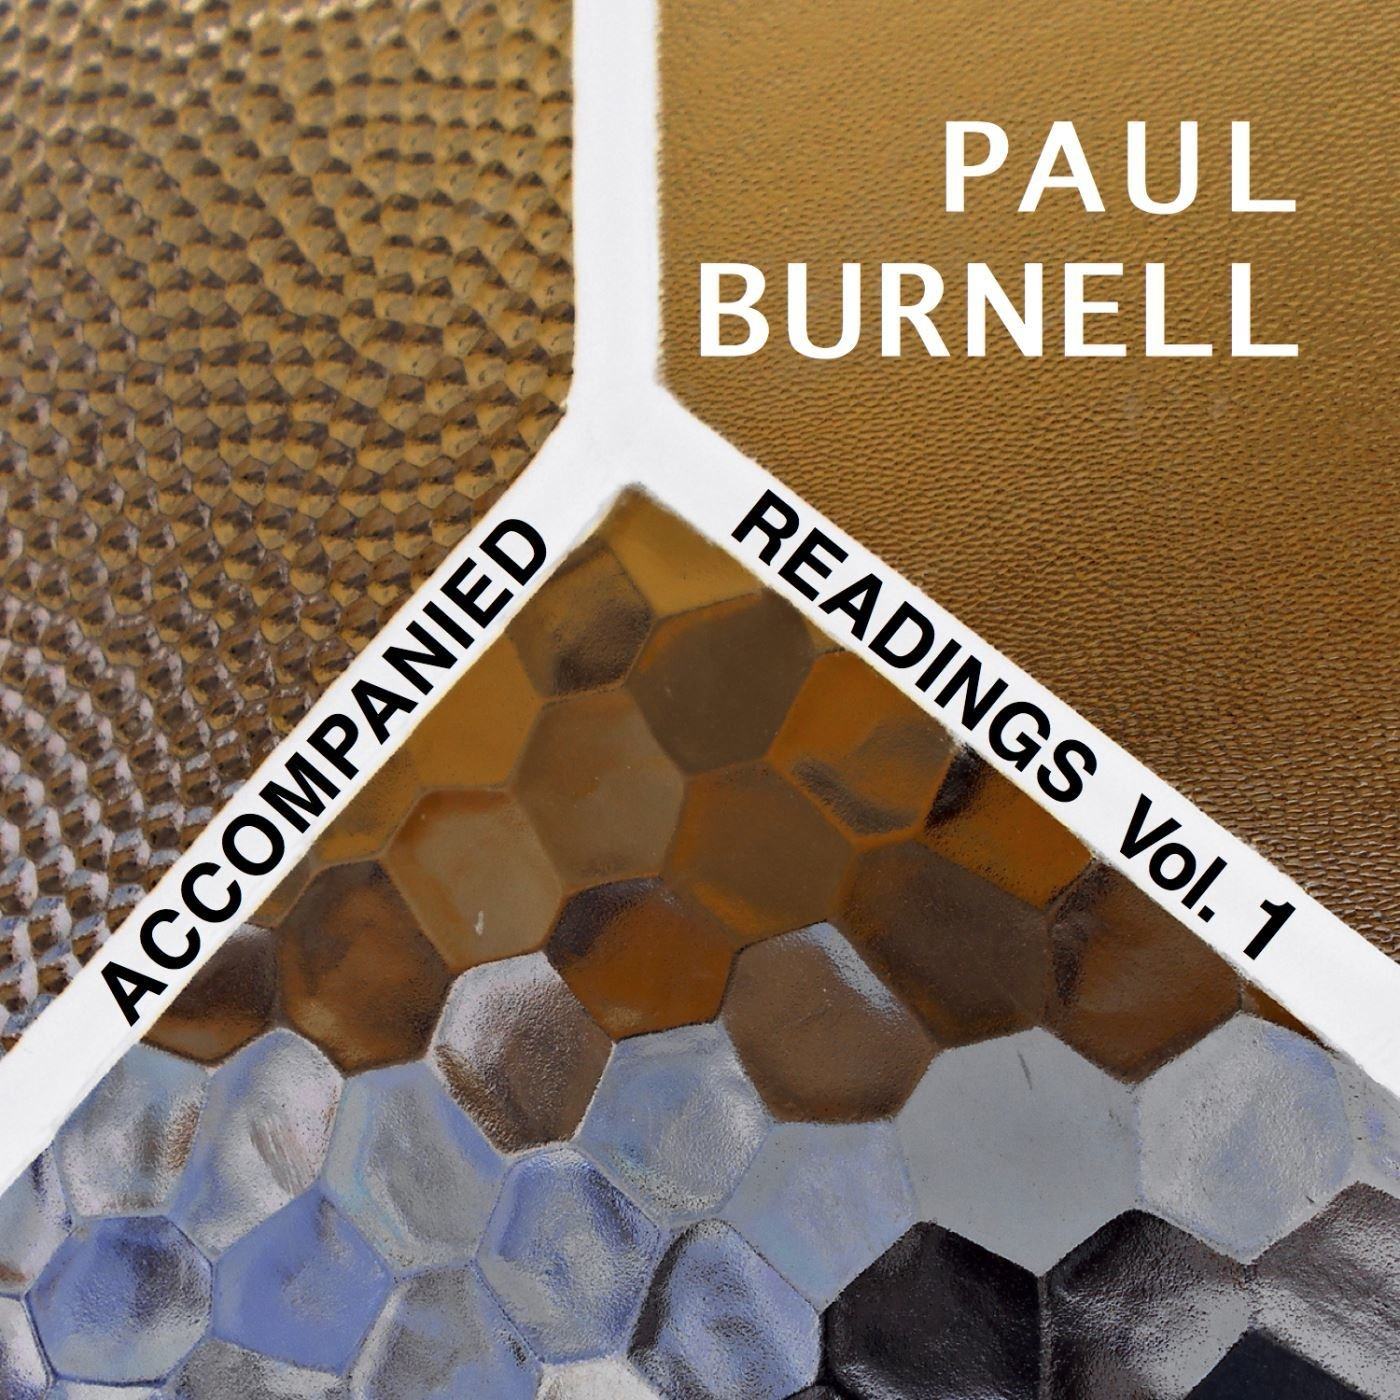 CD: Accompanied Readings Vol. 1